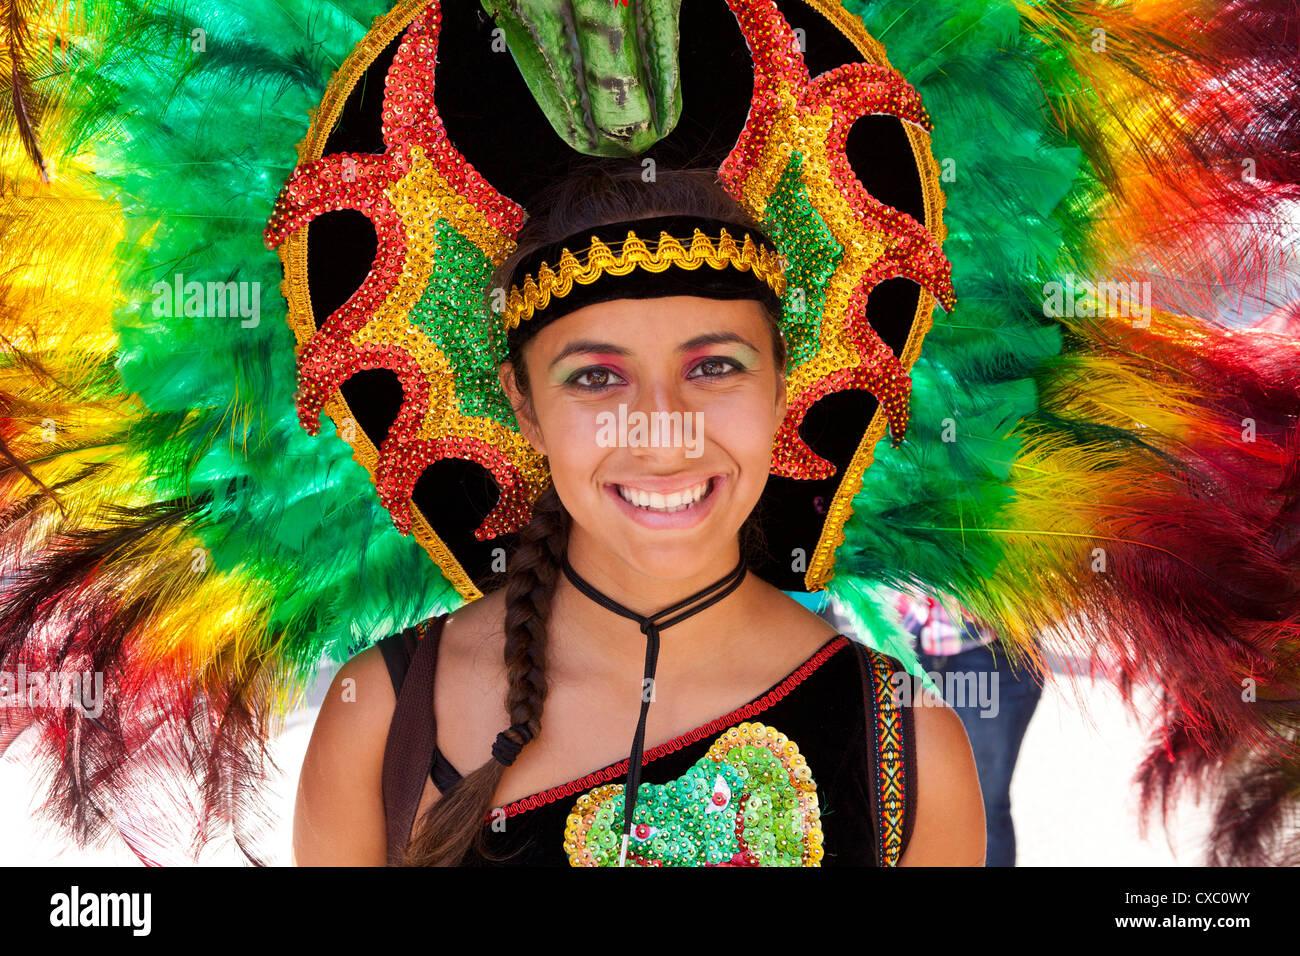 Bolivian traditional folk dancer with feather headdress at Latino festival - Washington, DC USA - Stock Image